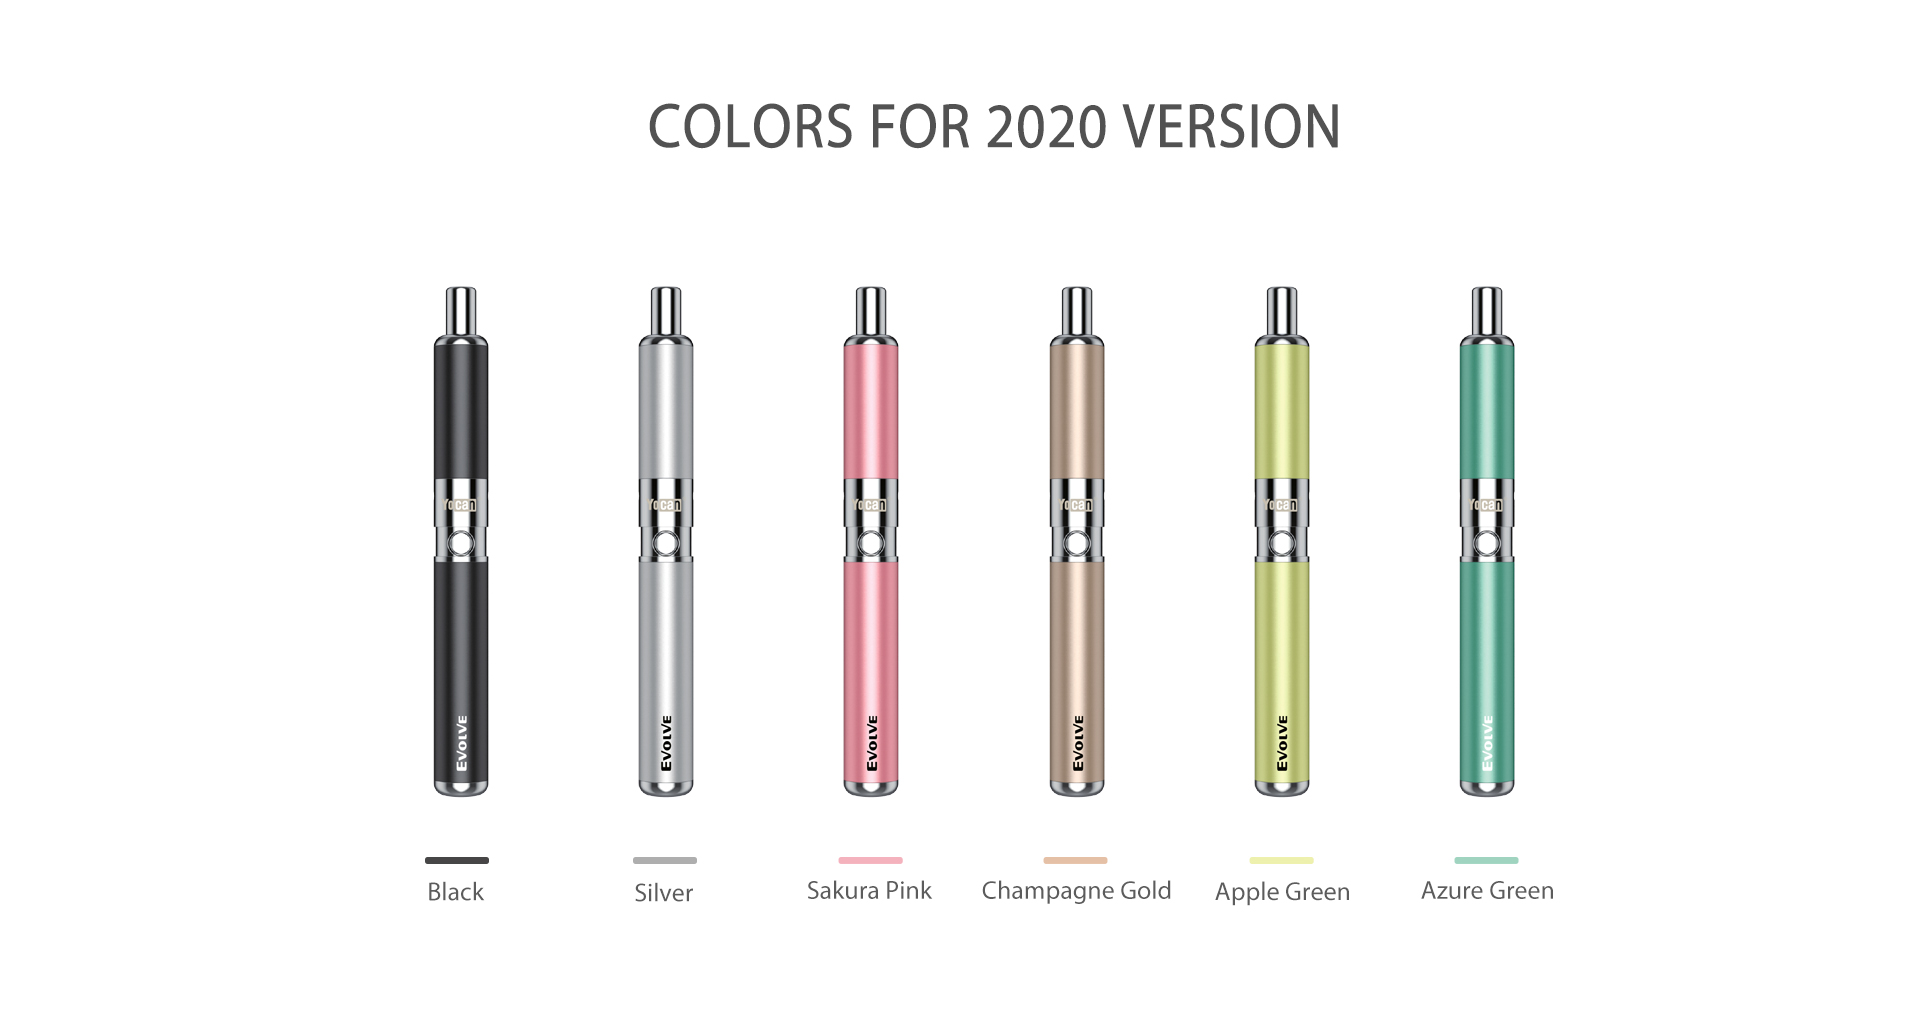 Yocan Evolve-D vaporizer pen 2020 version has six new colors.